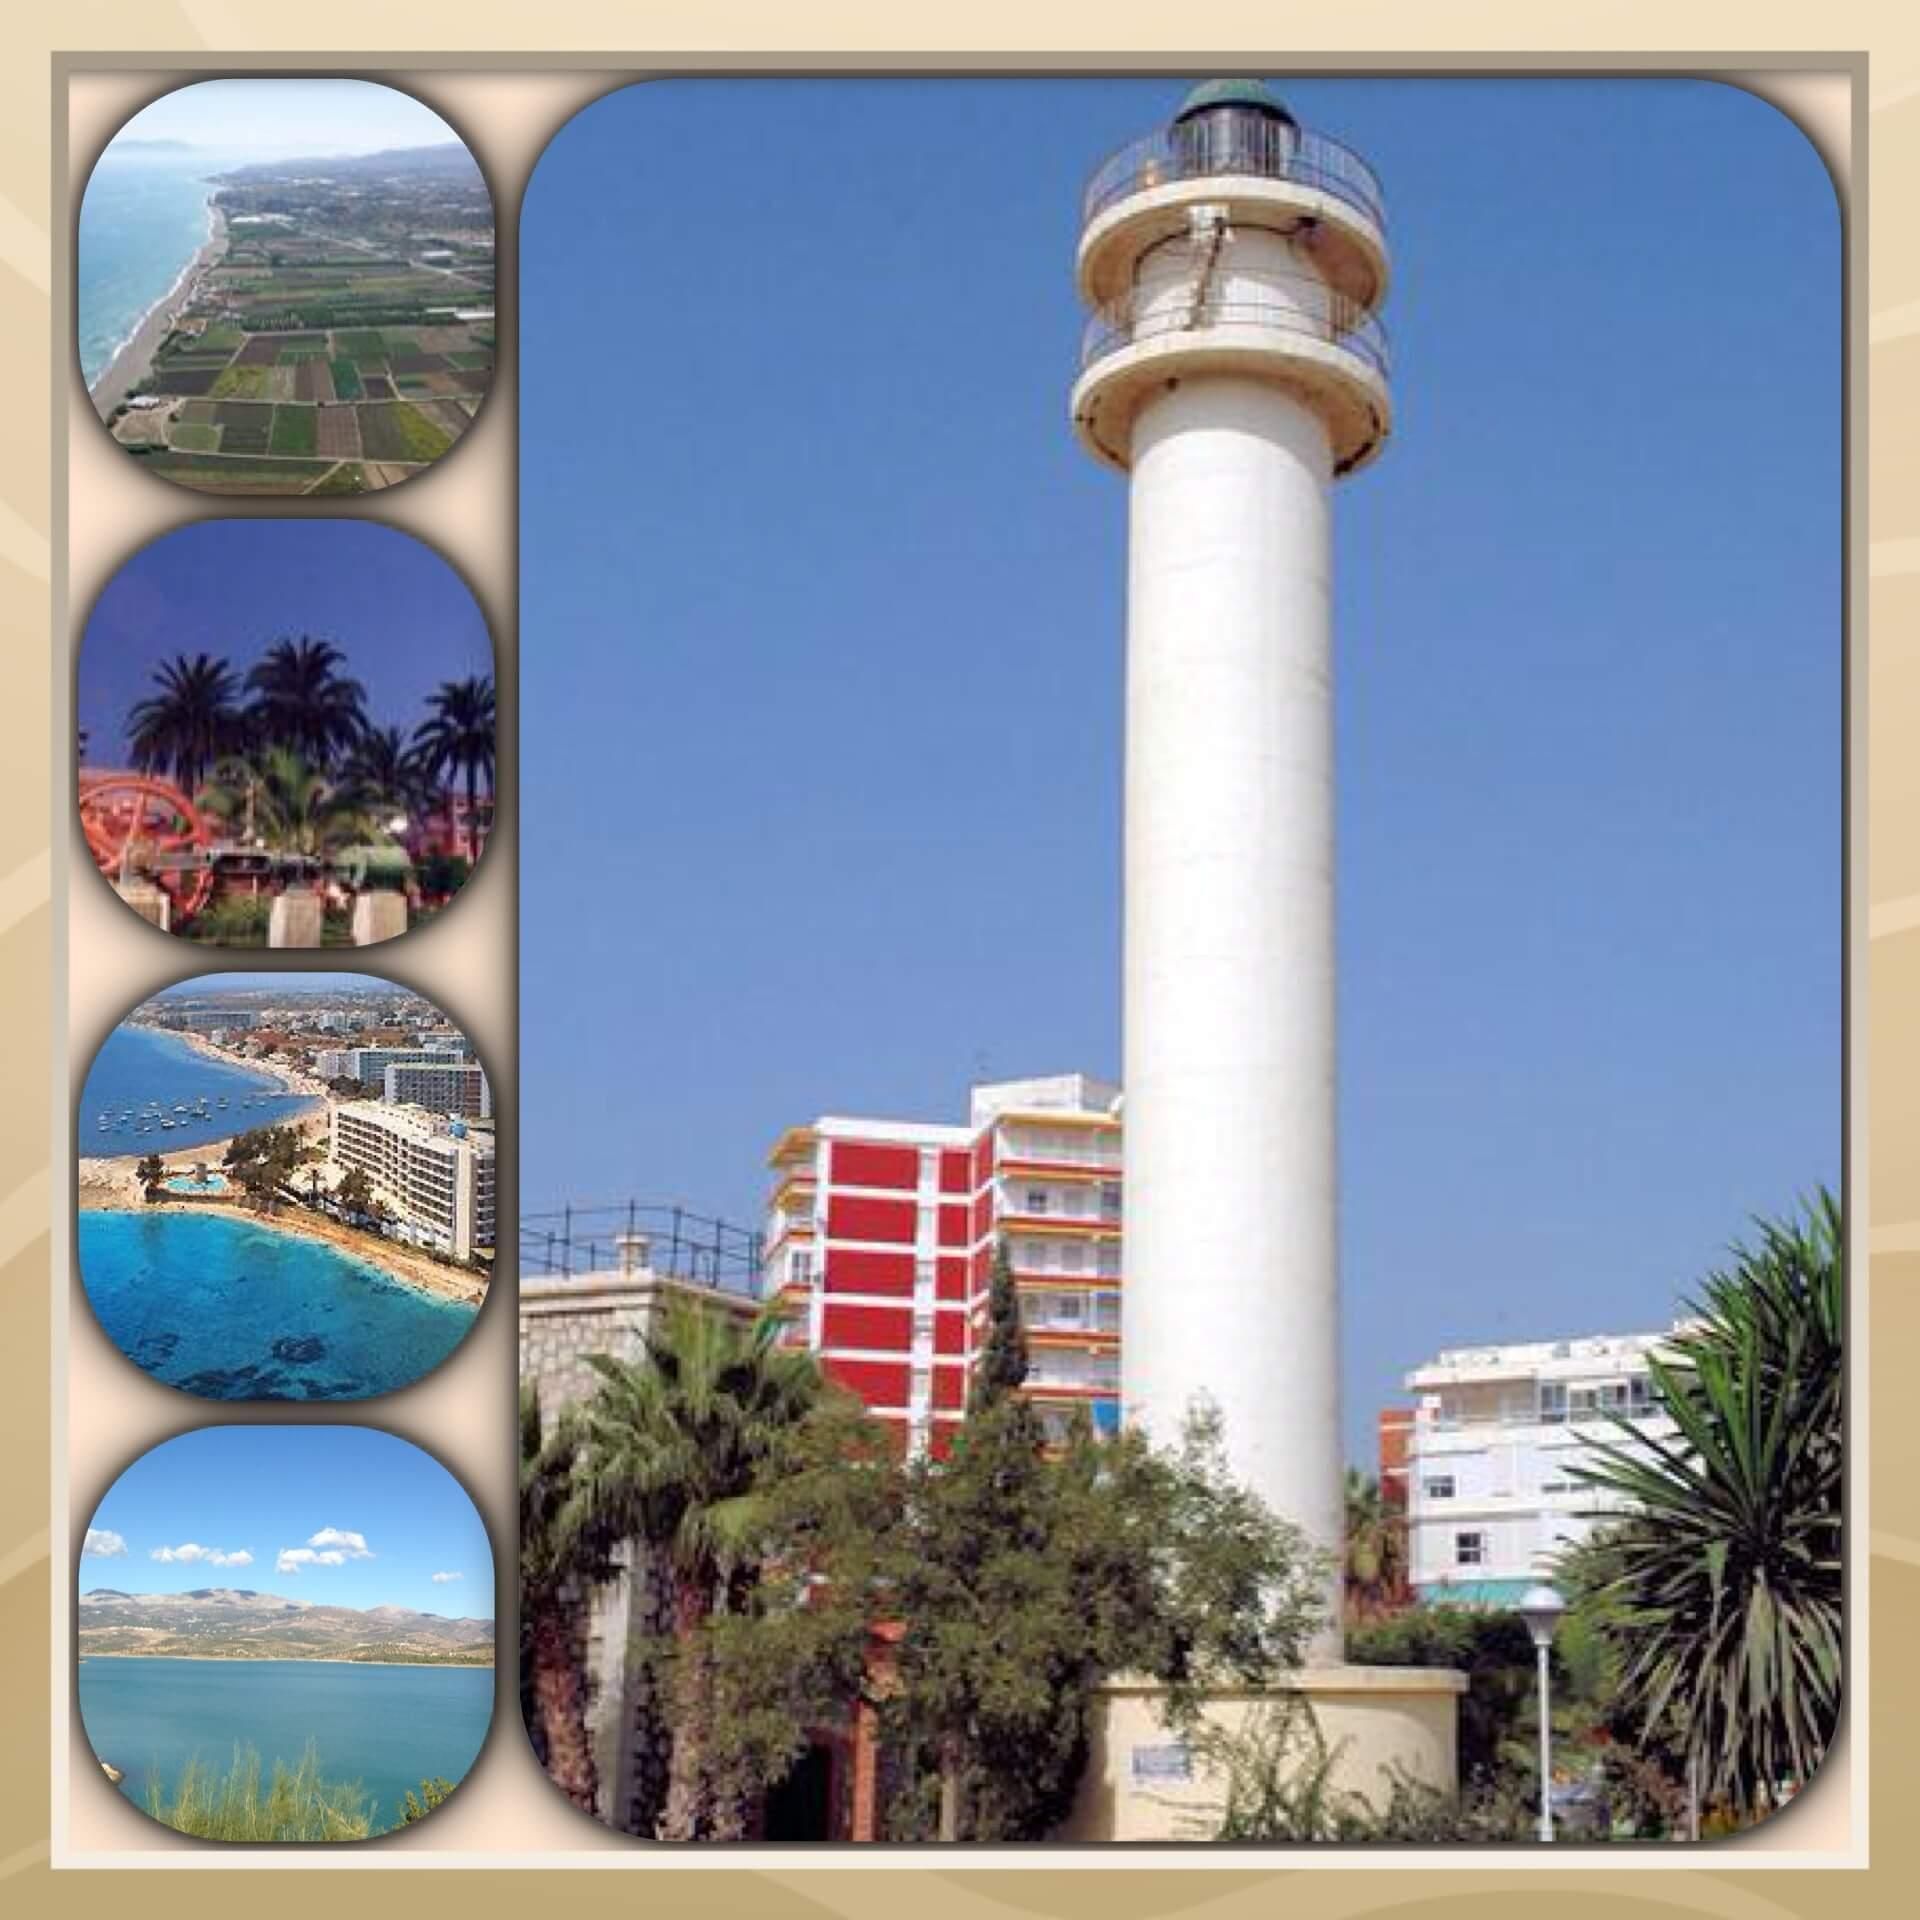 Location villa avec piscine espagne marylouque faire marylou villa avec piscine espagne for Cerrajero torre del mar